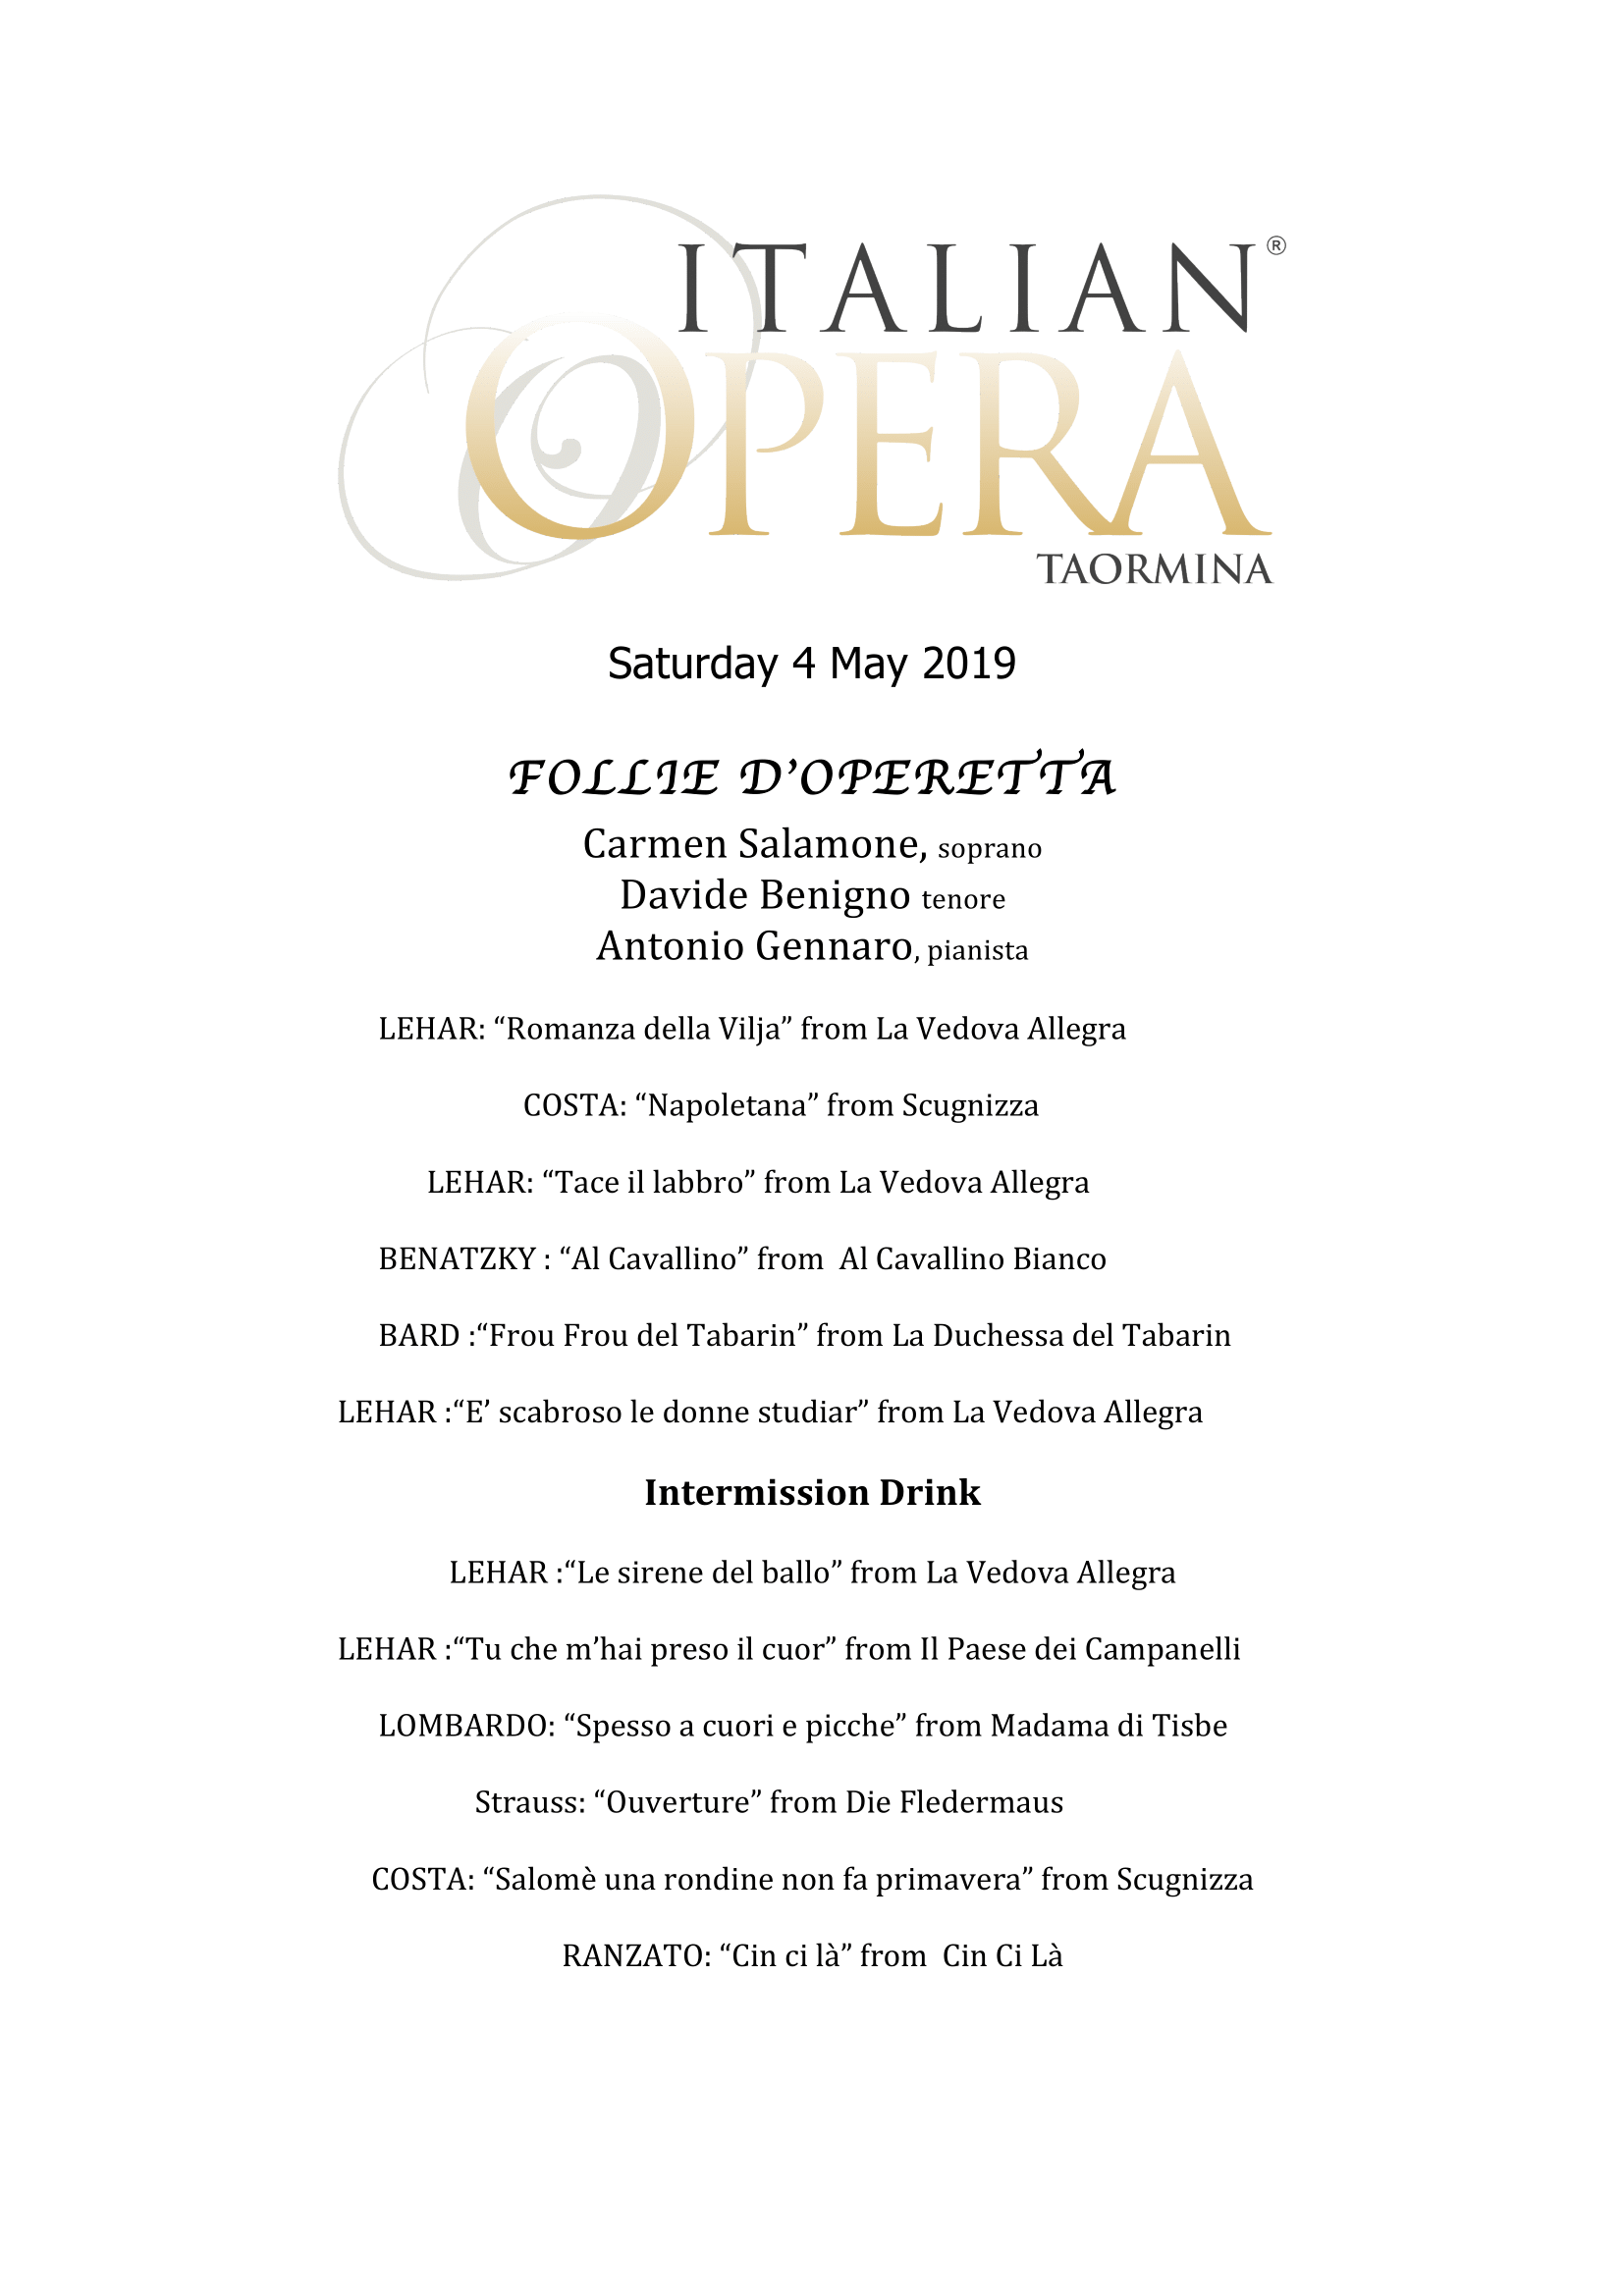 Italian Opera Taormina - 2019 - Taormina